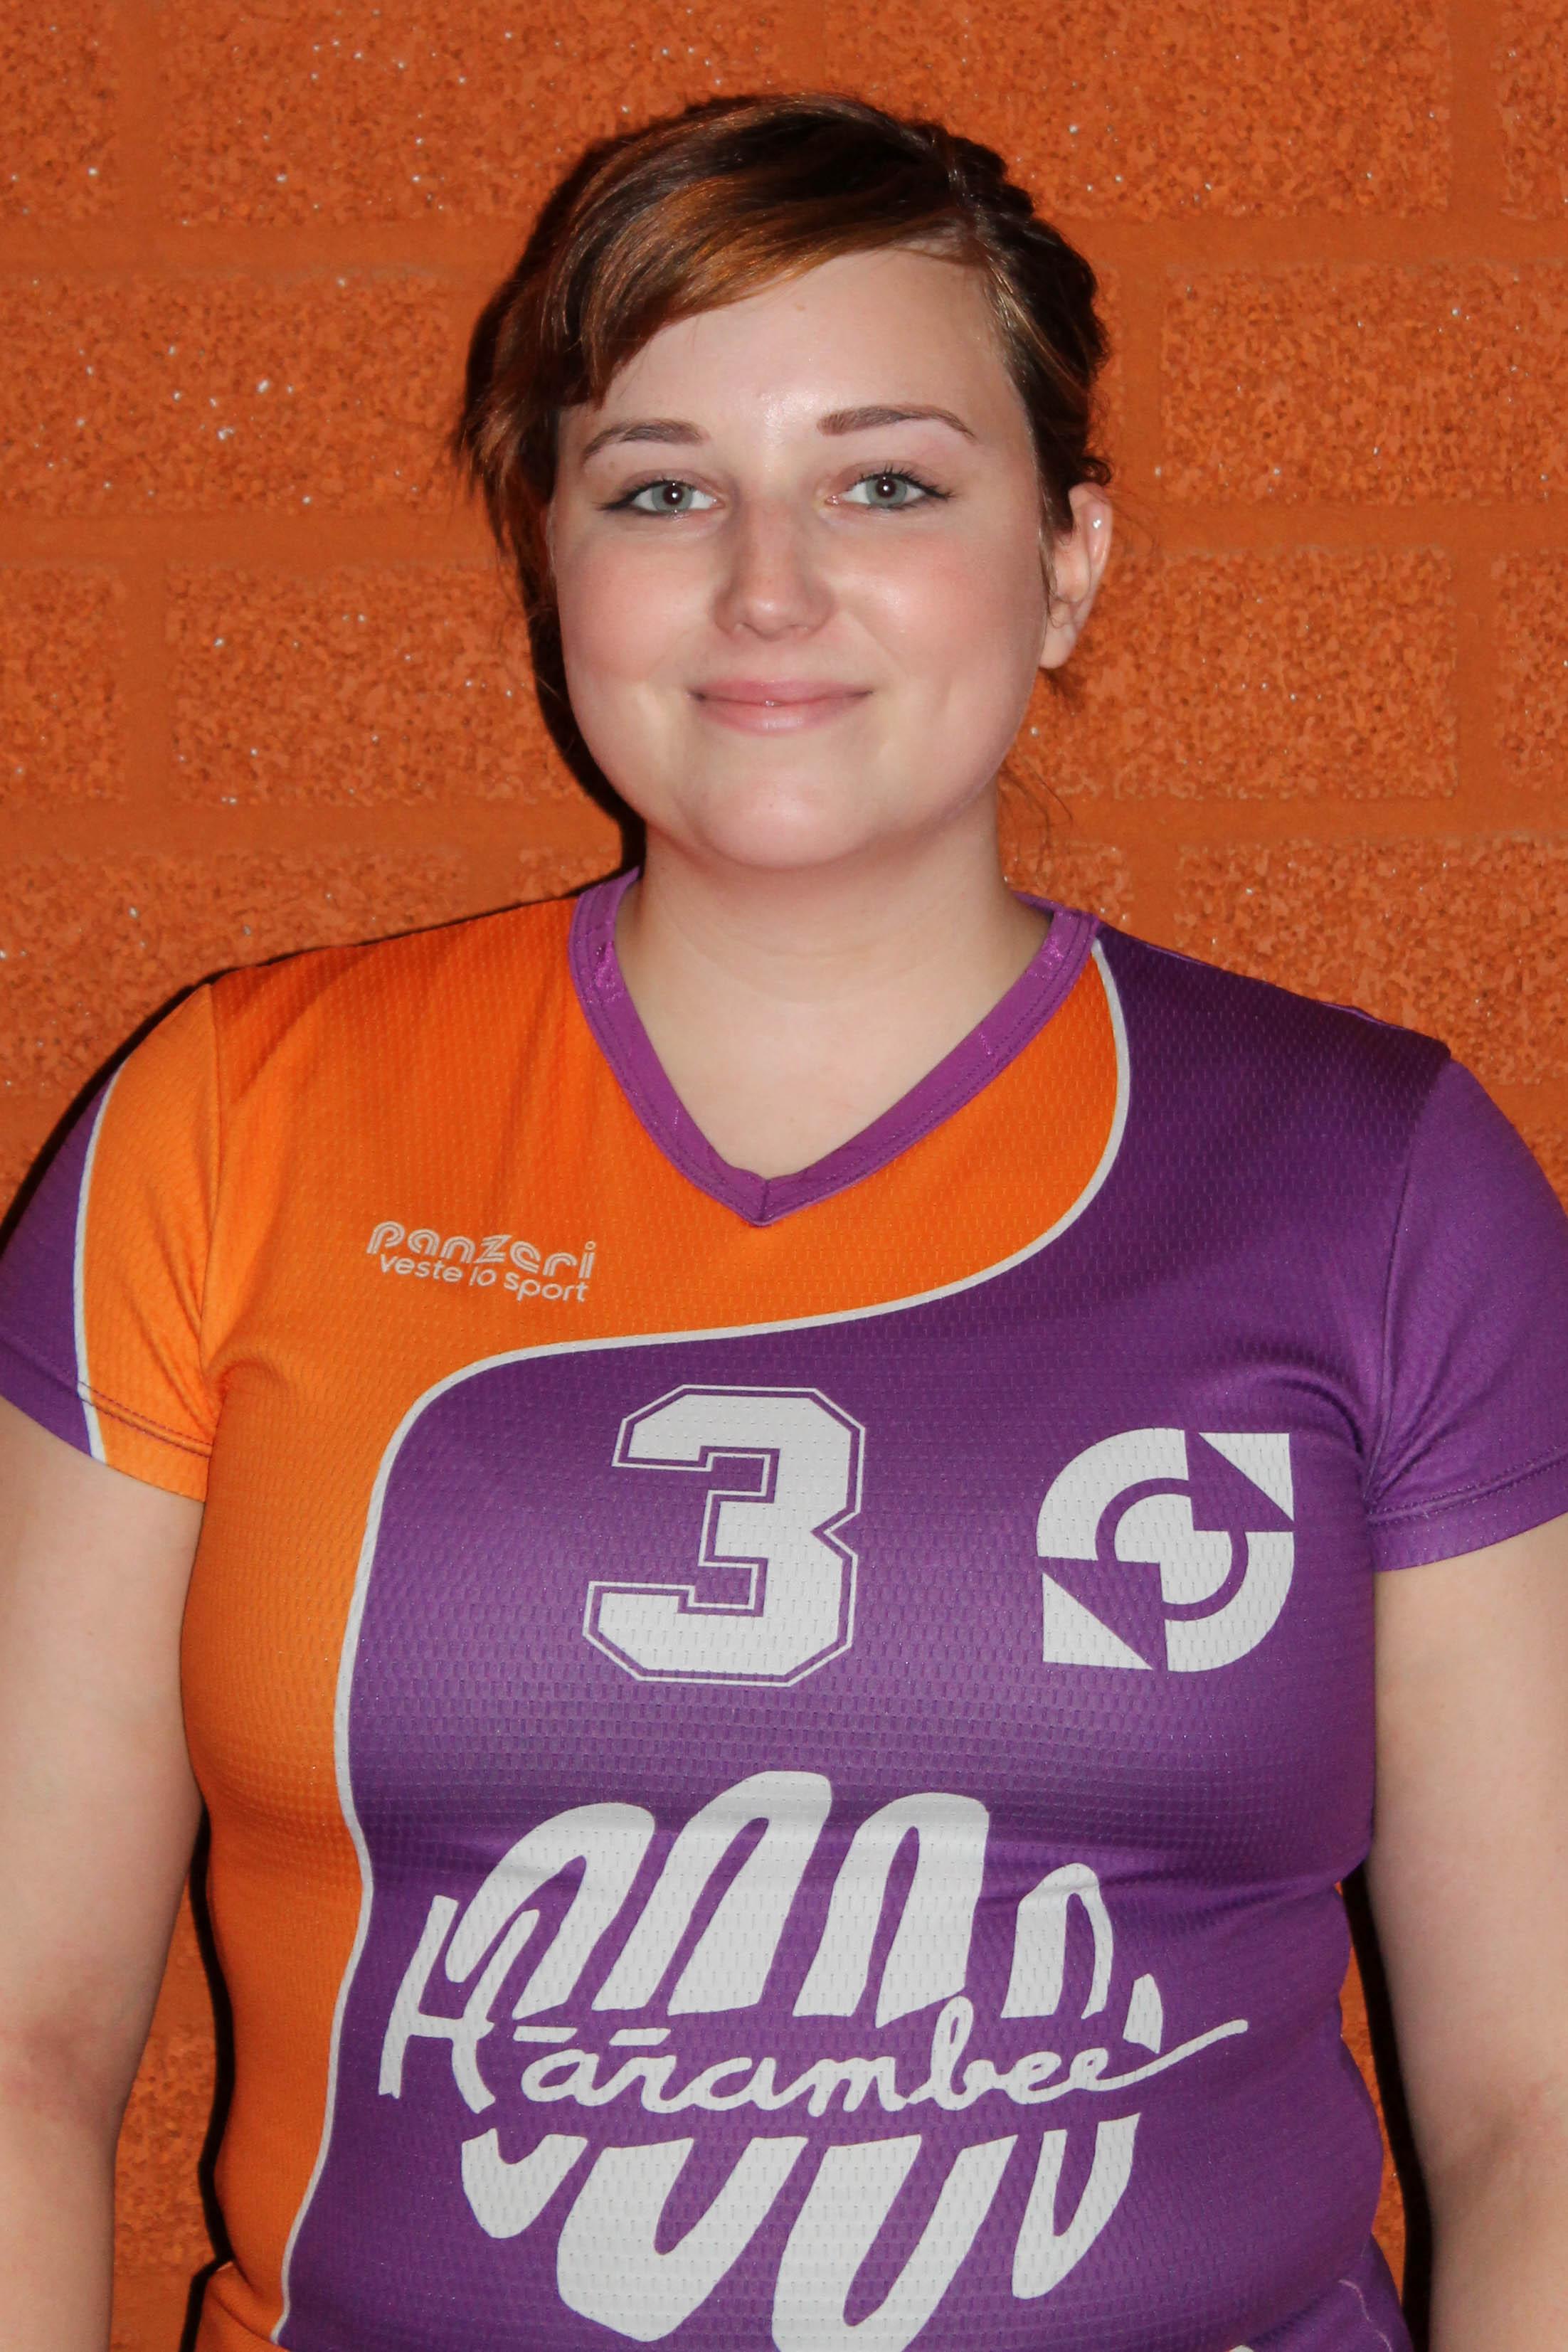 Nathalie van den Berg